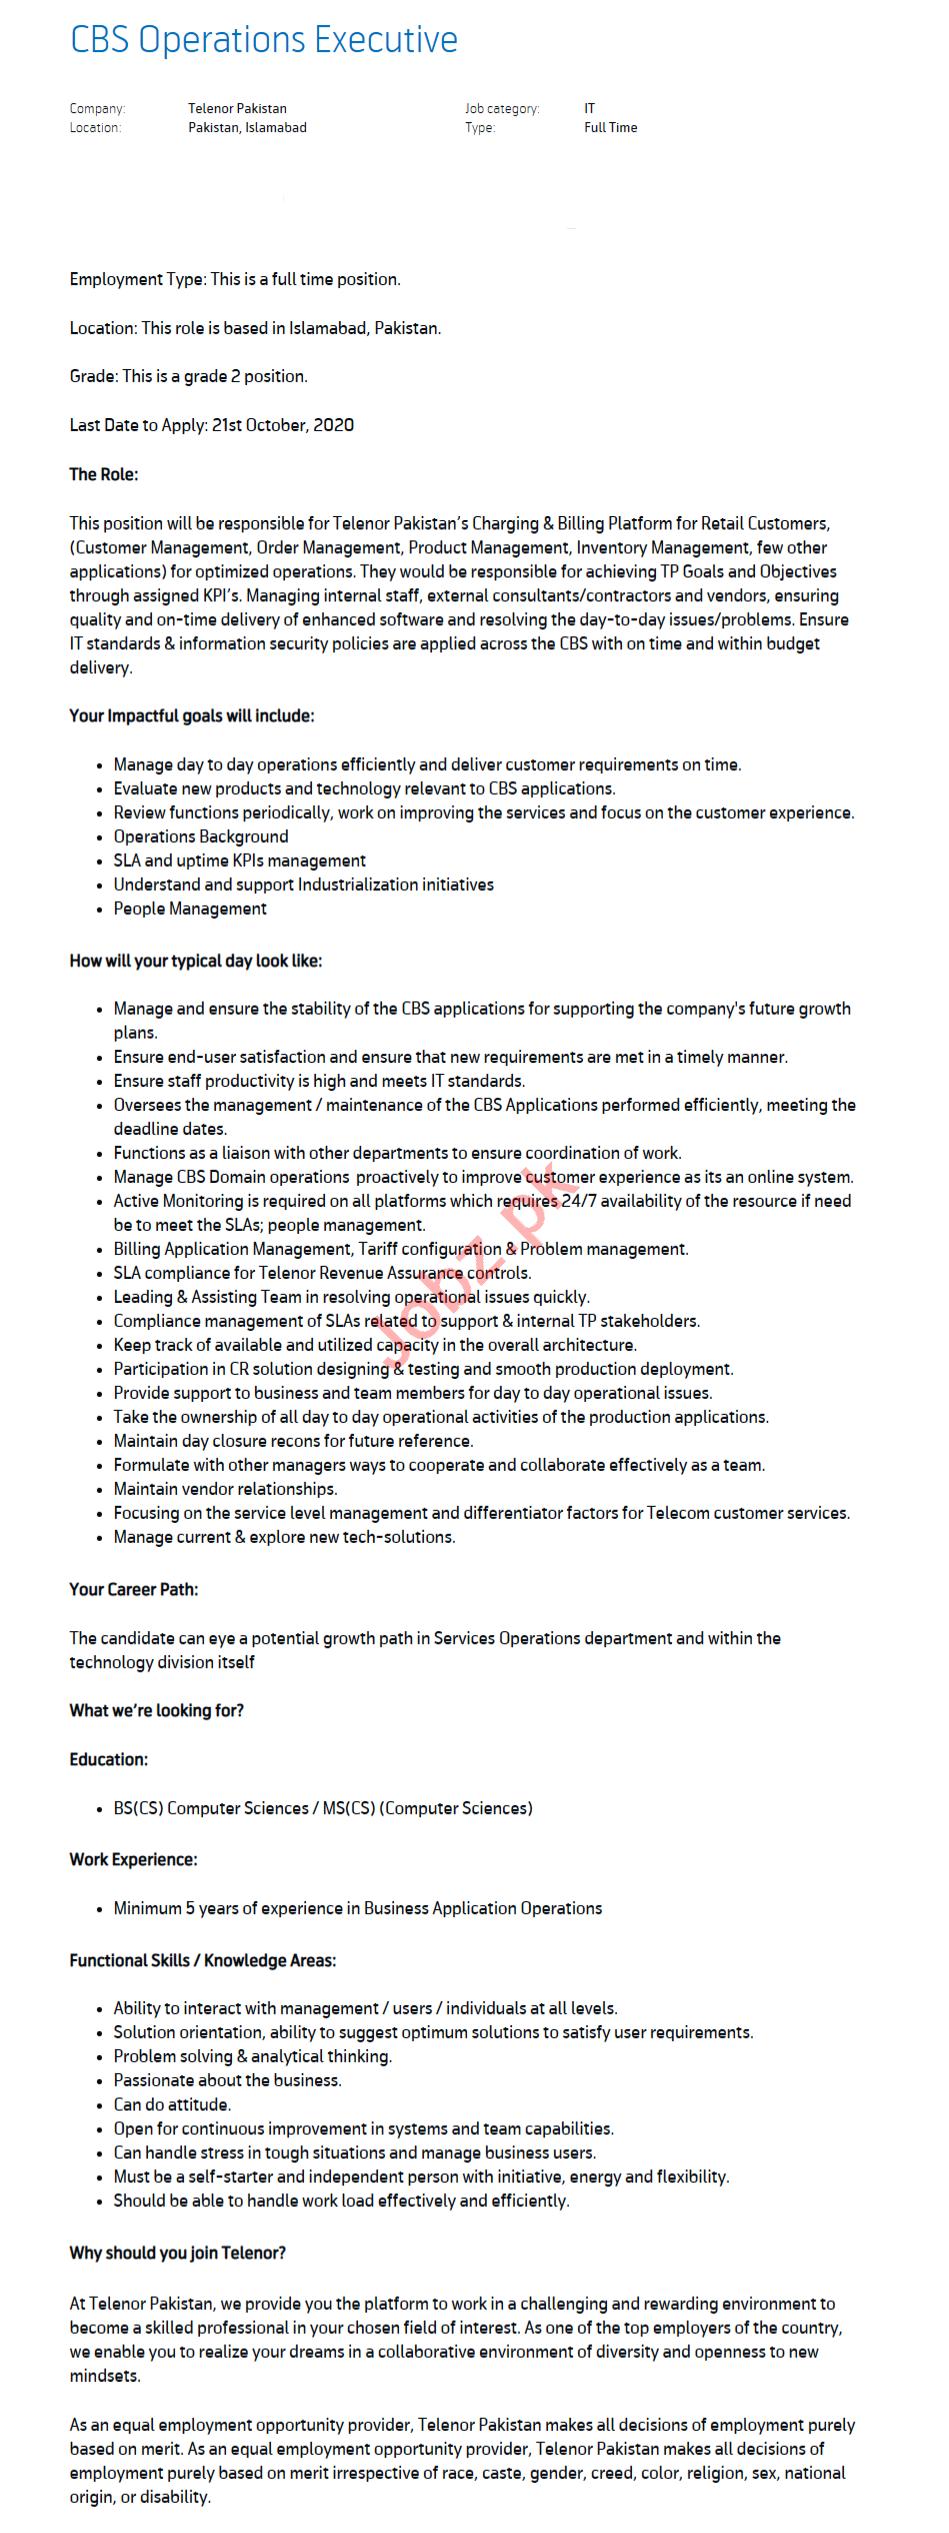 CBS Operations Executive & Operations Executive Jobs 2020